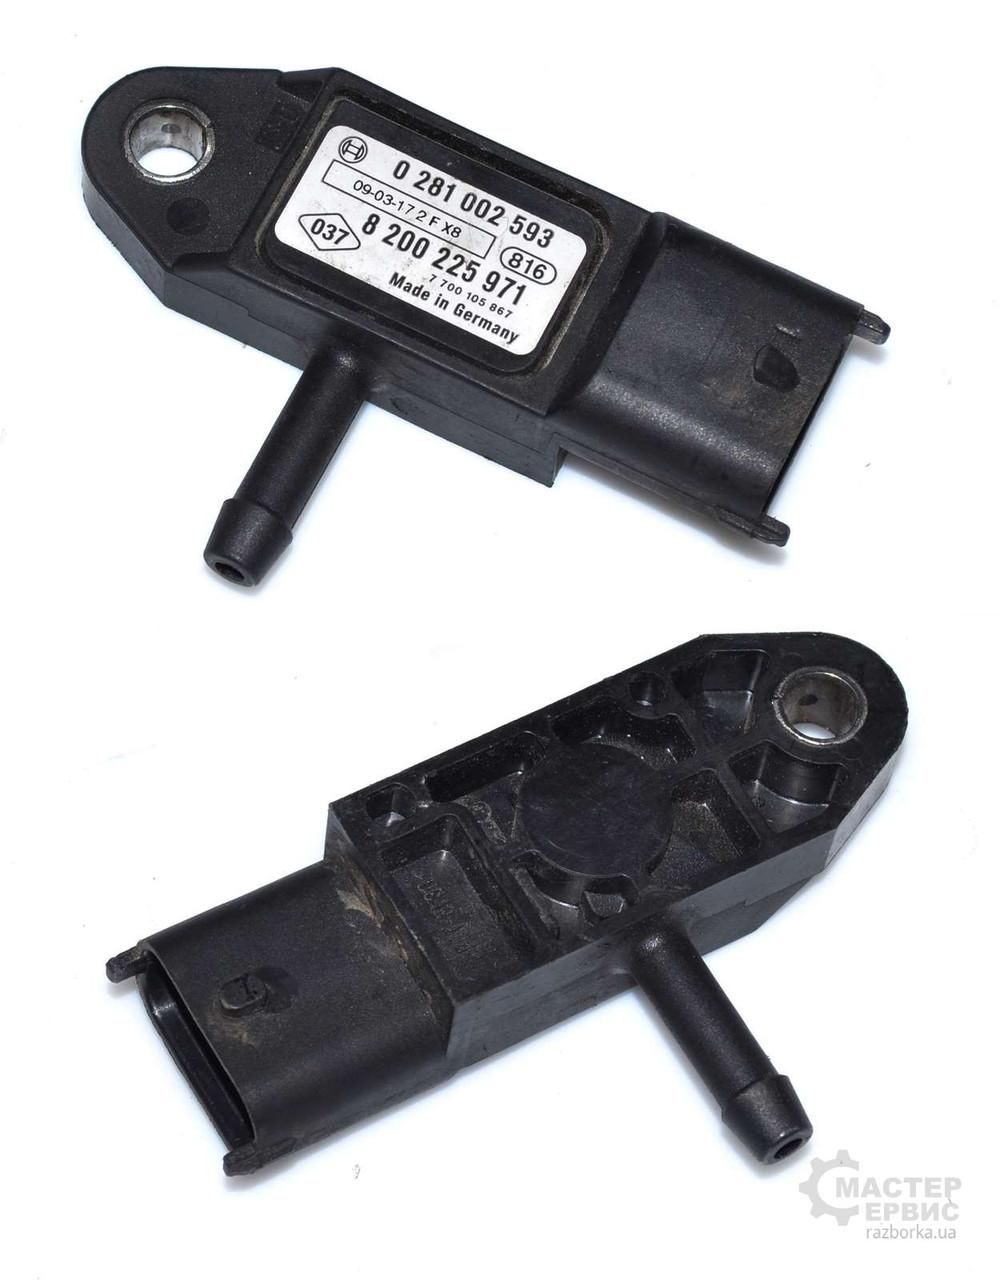 Мапсенсор для Renault Trafic 2000-2014 0281002593, 223657266R, 8200225971